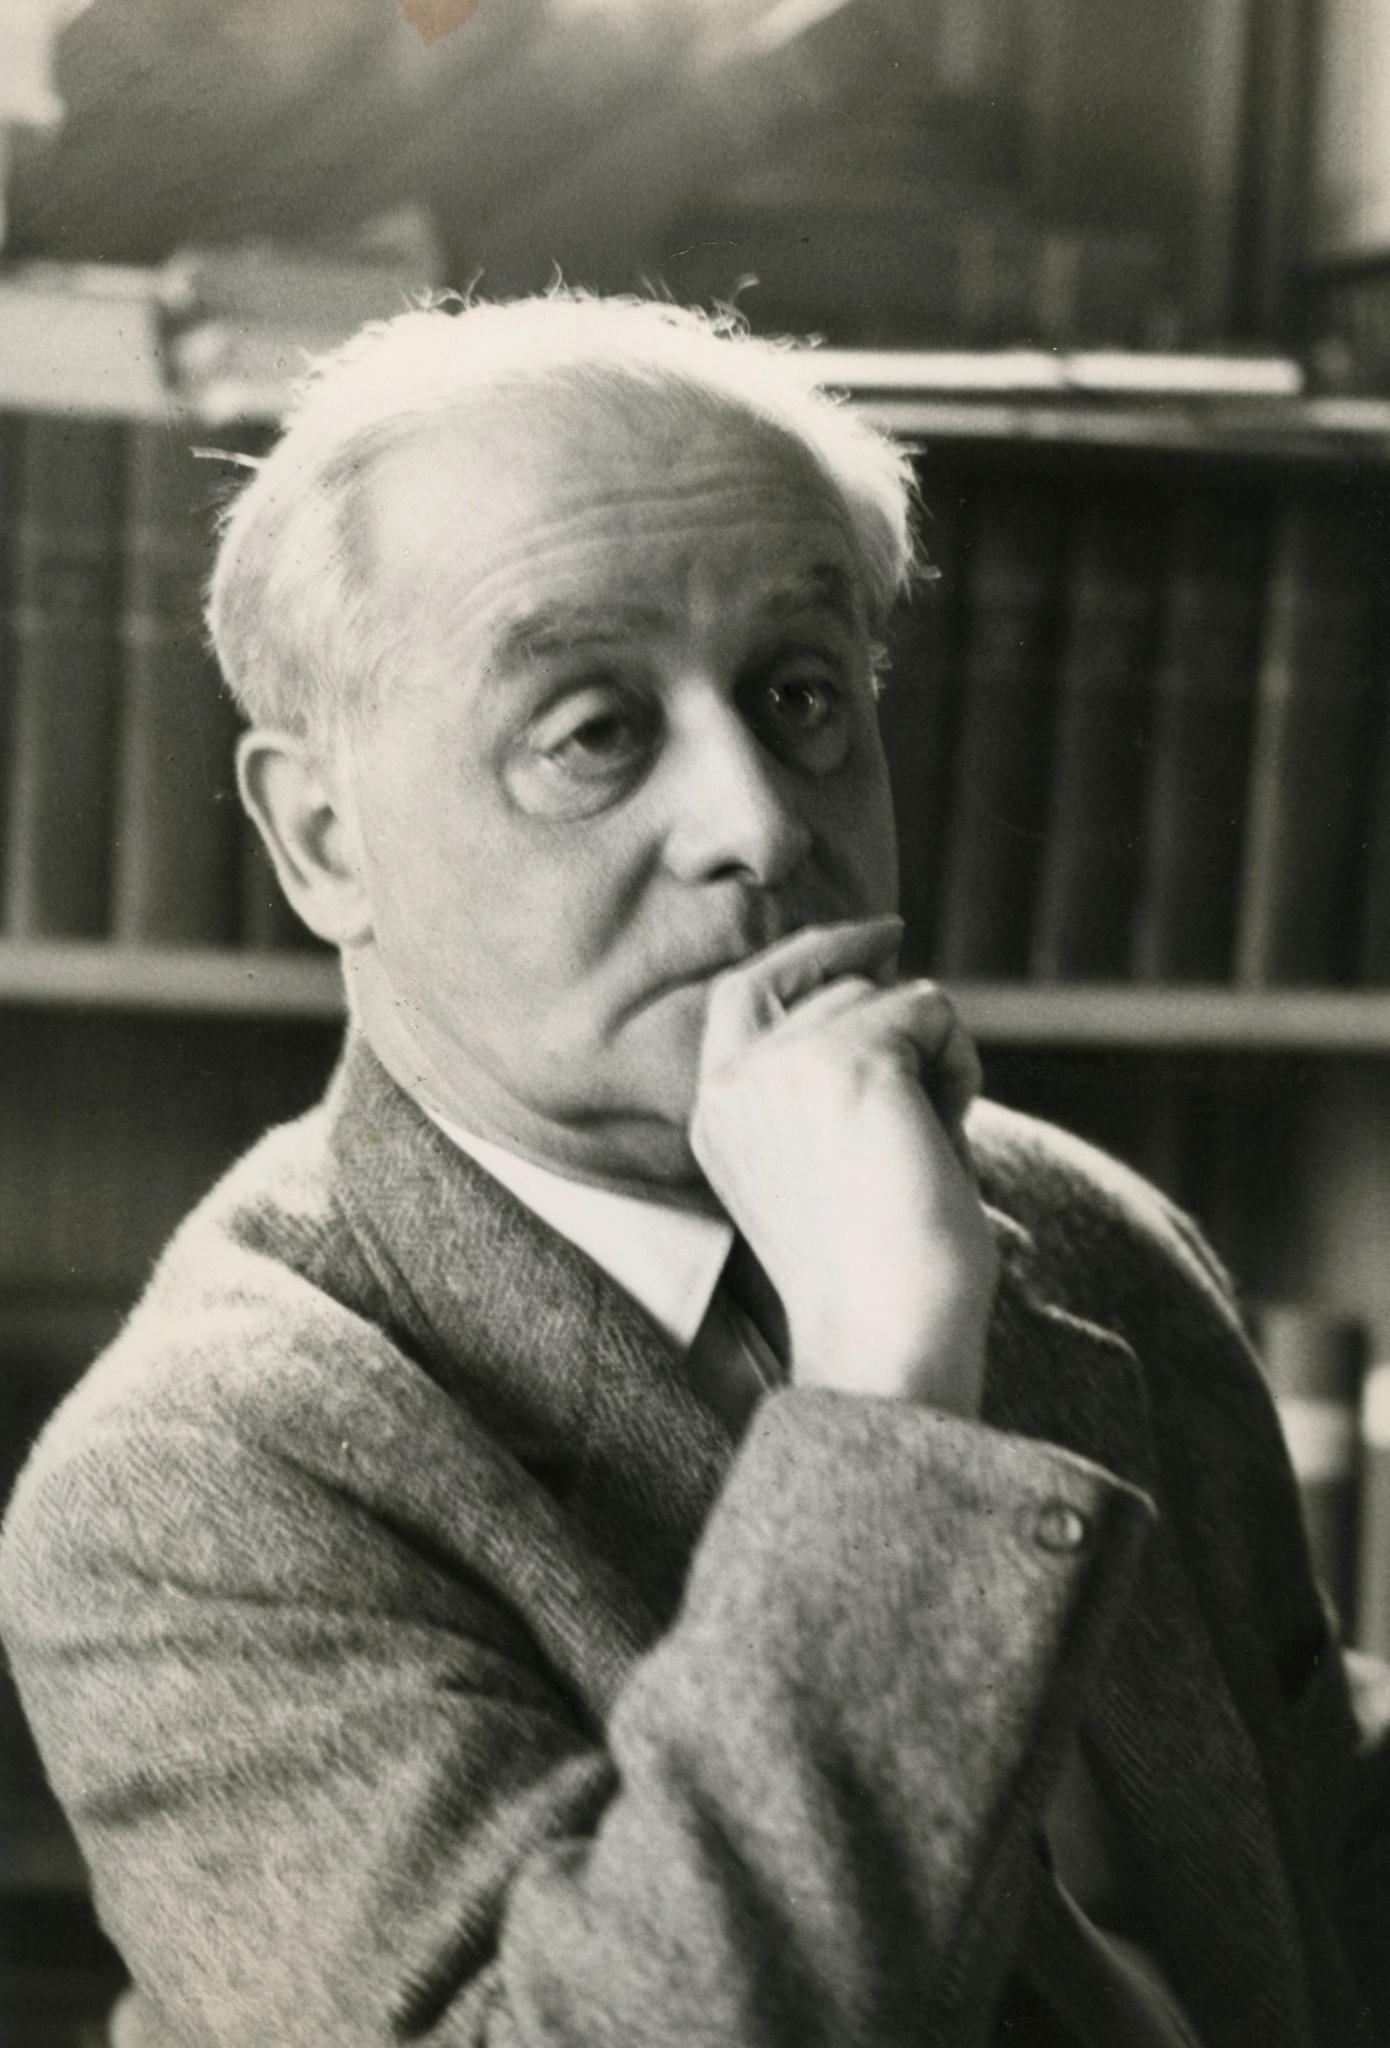 <div class='inner-box'><div class='close-desc'></div>  <span class='opis'>Jerzy Giedroyc. Maisons-Laffitte (pokój Henryka Giedroycia), 1965.</span>   </div>